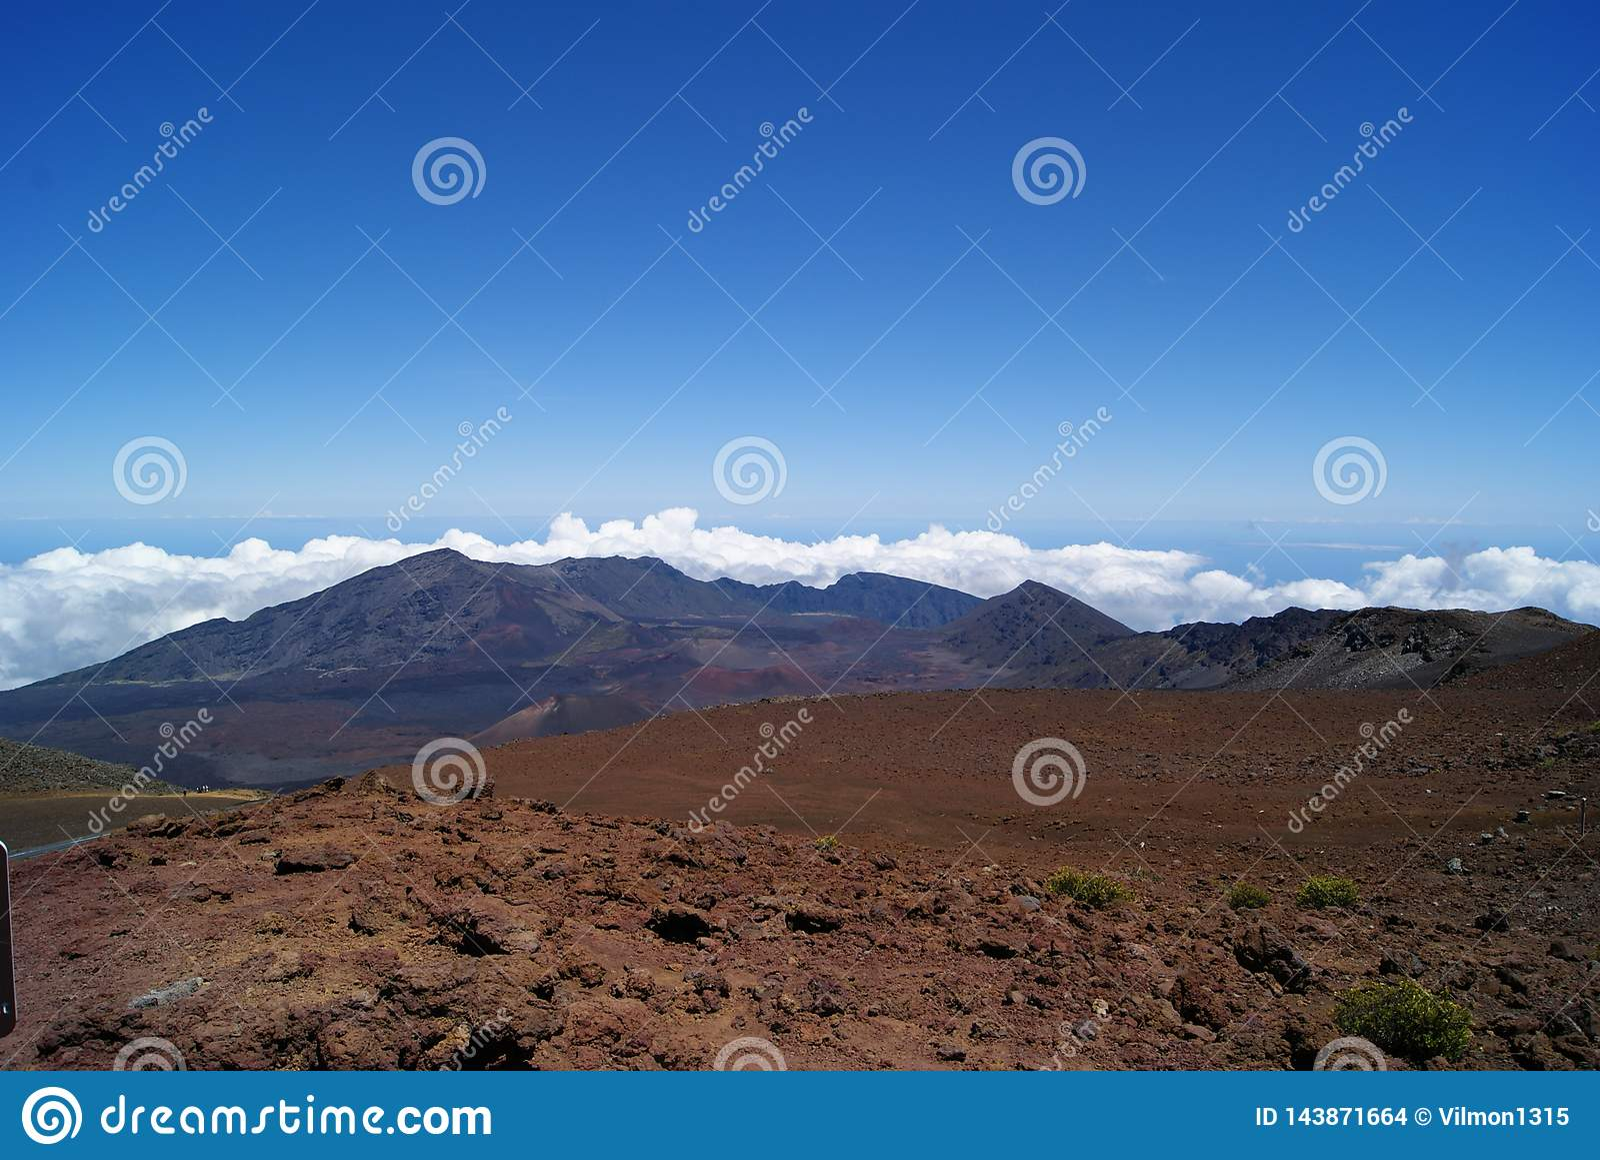 Auf dem Haleakala-Vulkan in Maui Hawaii